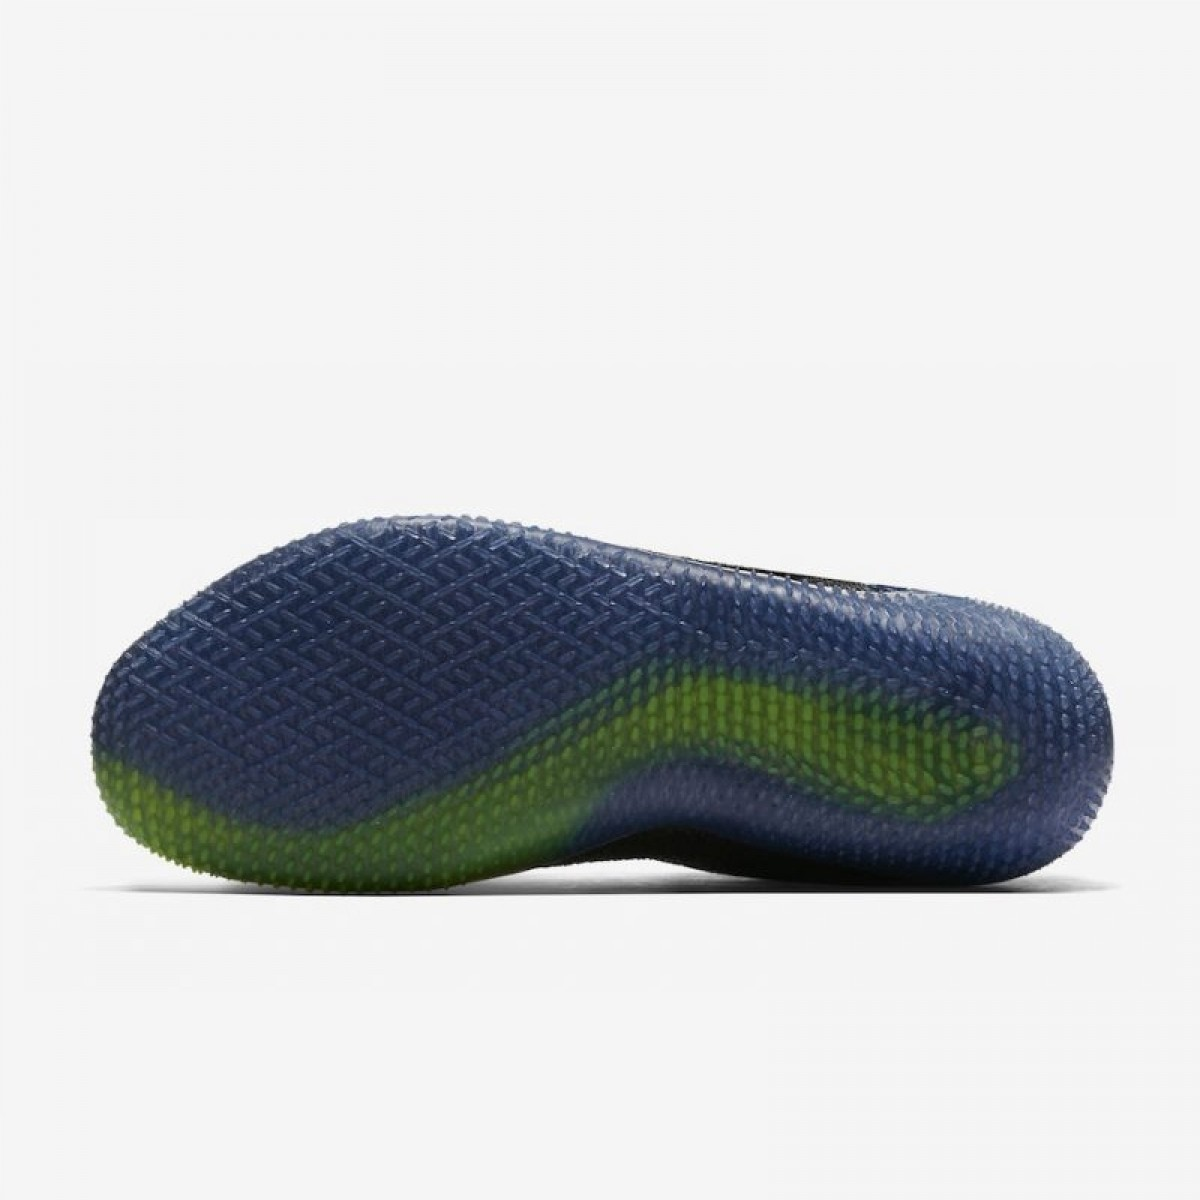 best sneakers e7fc0 7ee69 Nike Kobe AD NXT 360 'Mamba Day'